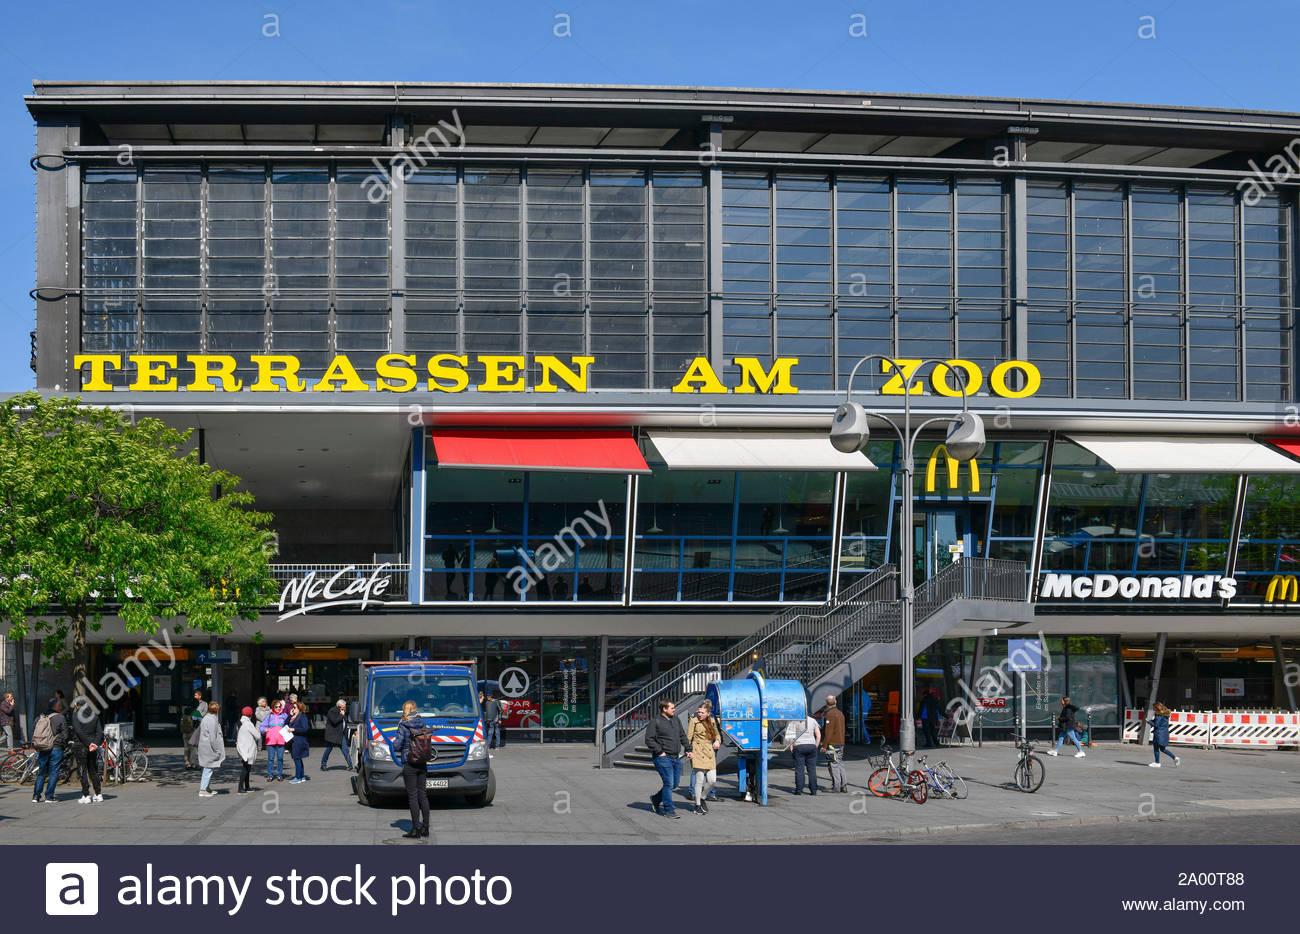 Bahnhof Zoologischer Garten Berlin Neu Bahnhof Zoo Stock S & Bahnhof Zoo Stock Page 3